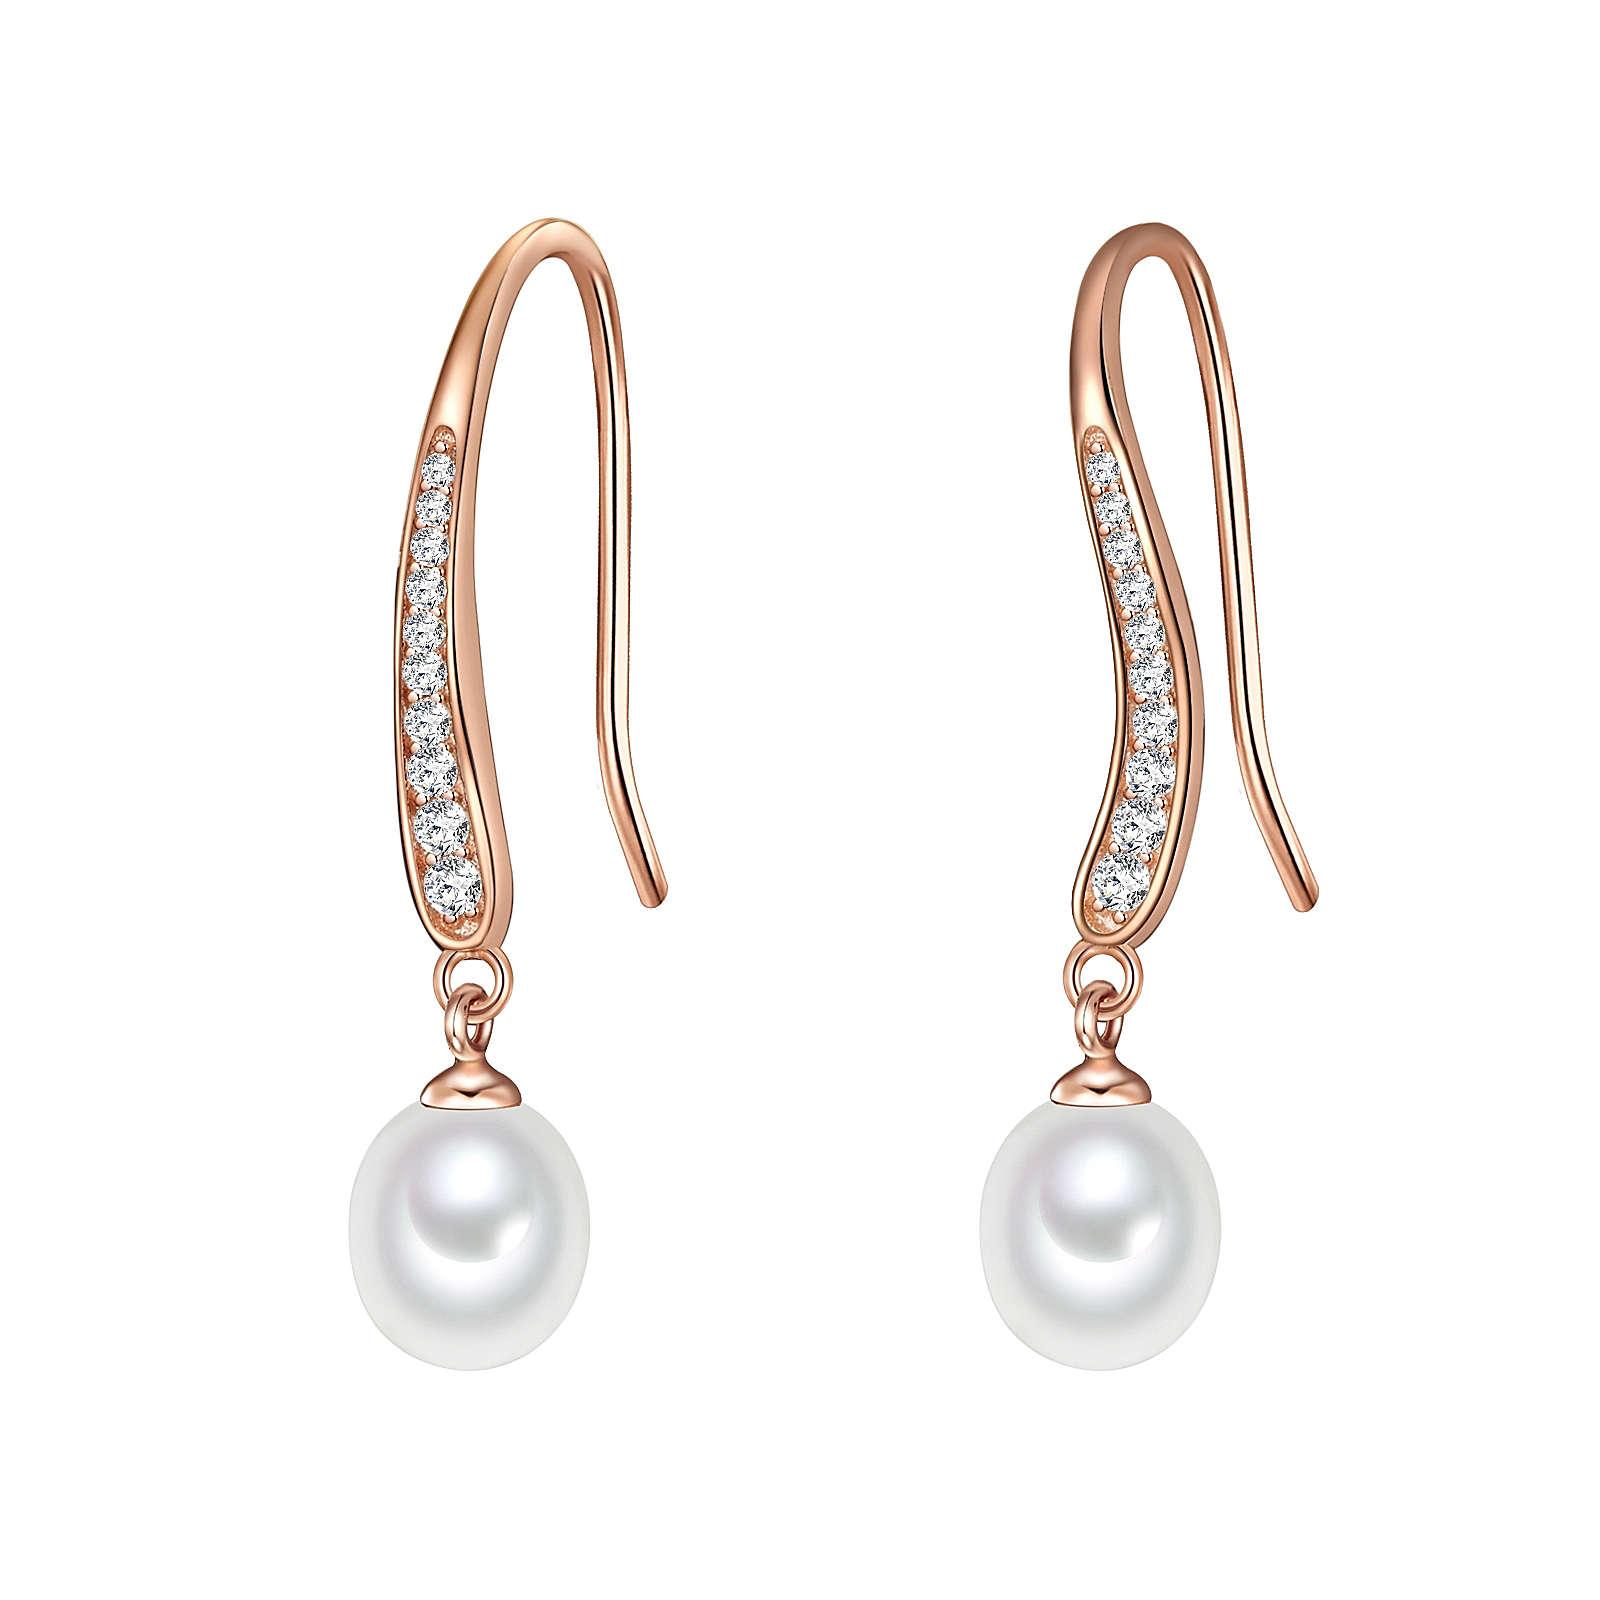 Valero Pearls Ohrhänger Sterling Silber rosévergoldet Süßwasser-Zuchtperlen weiß Ohrhänger rosegold Damen